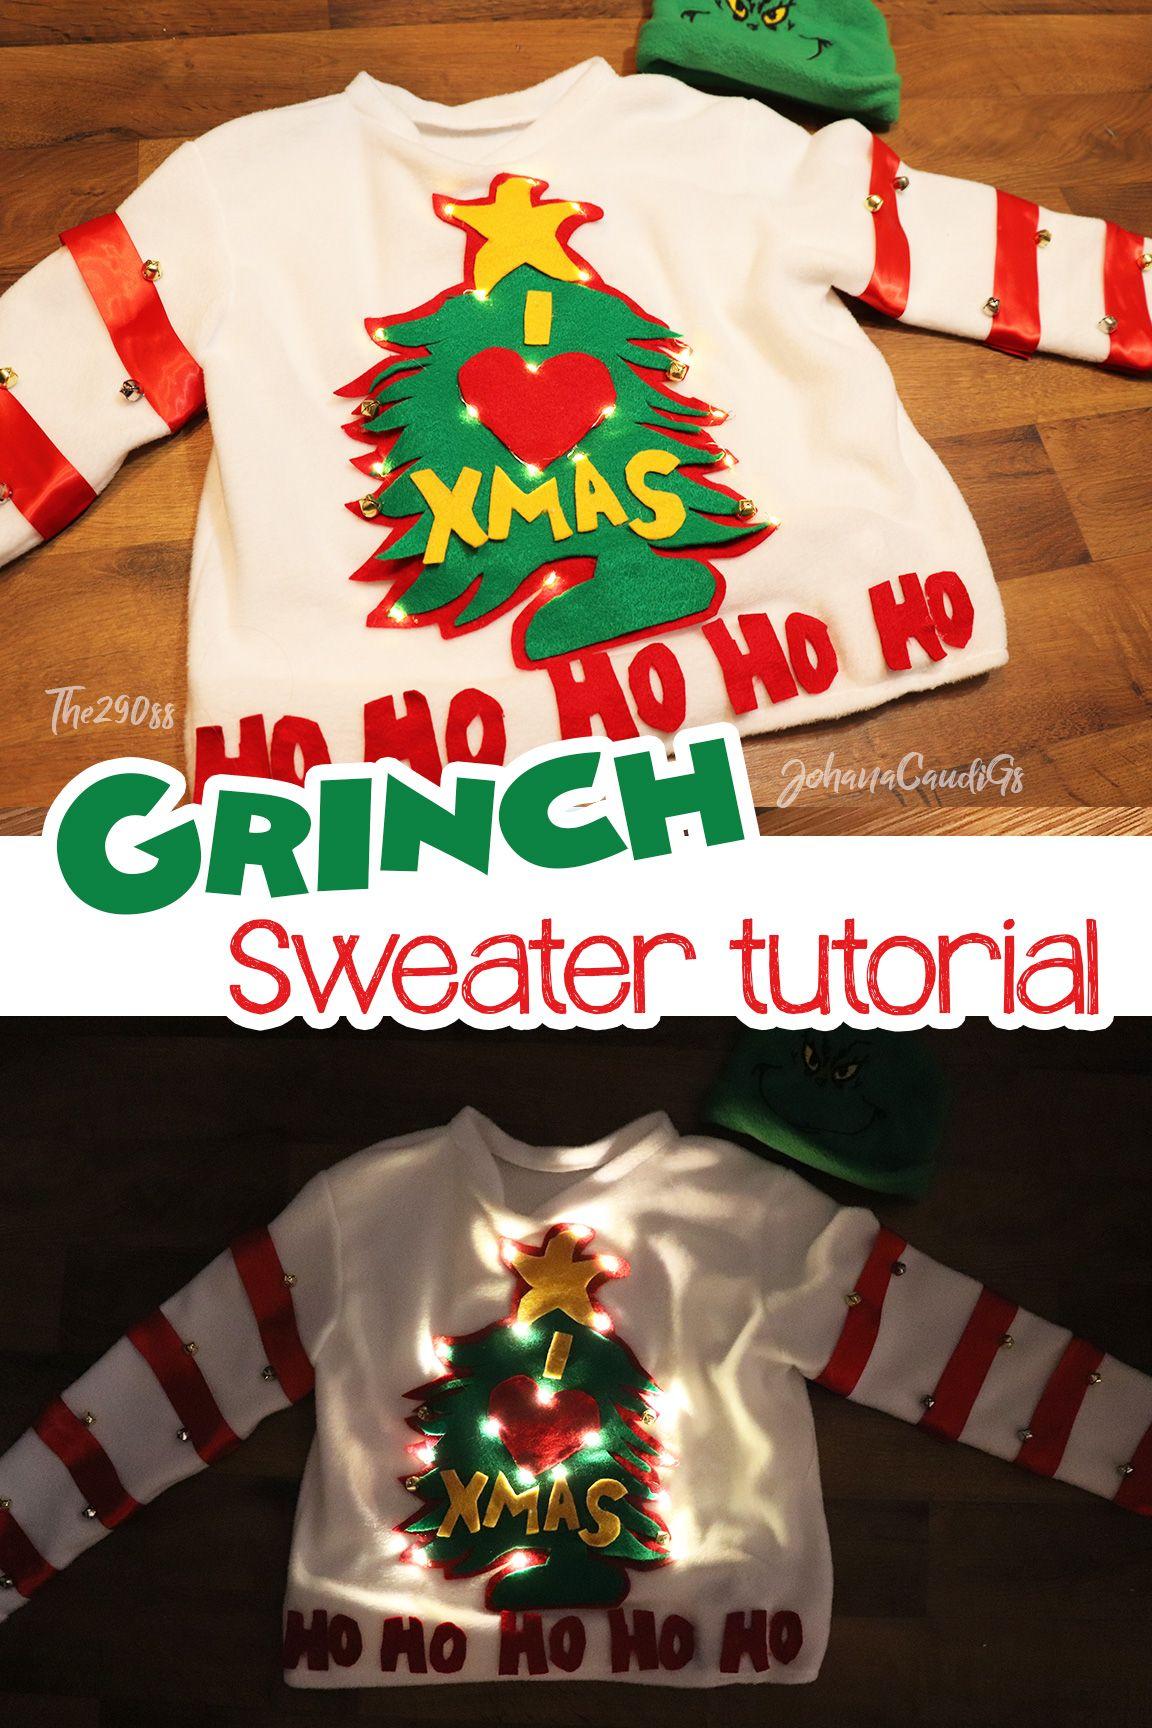 Grinch Sweater Tutorial I Heart Xmas Thegrinch Christmas